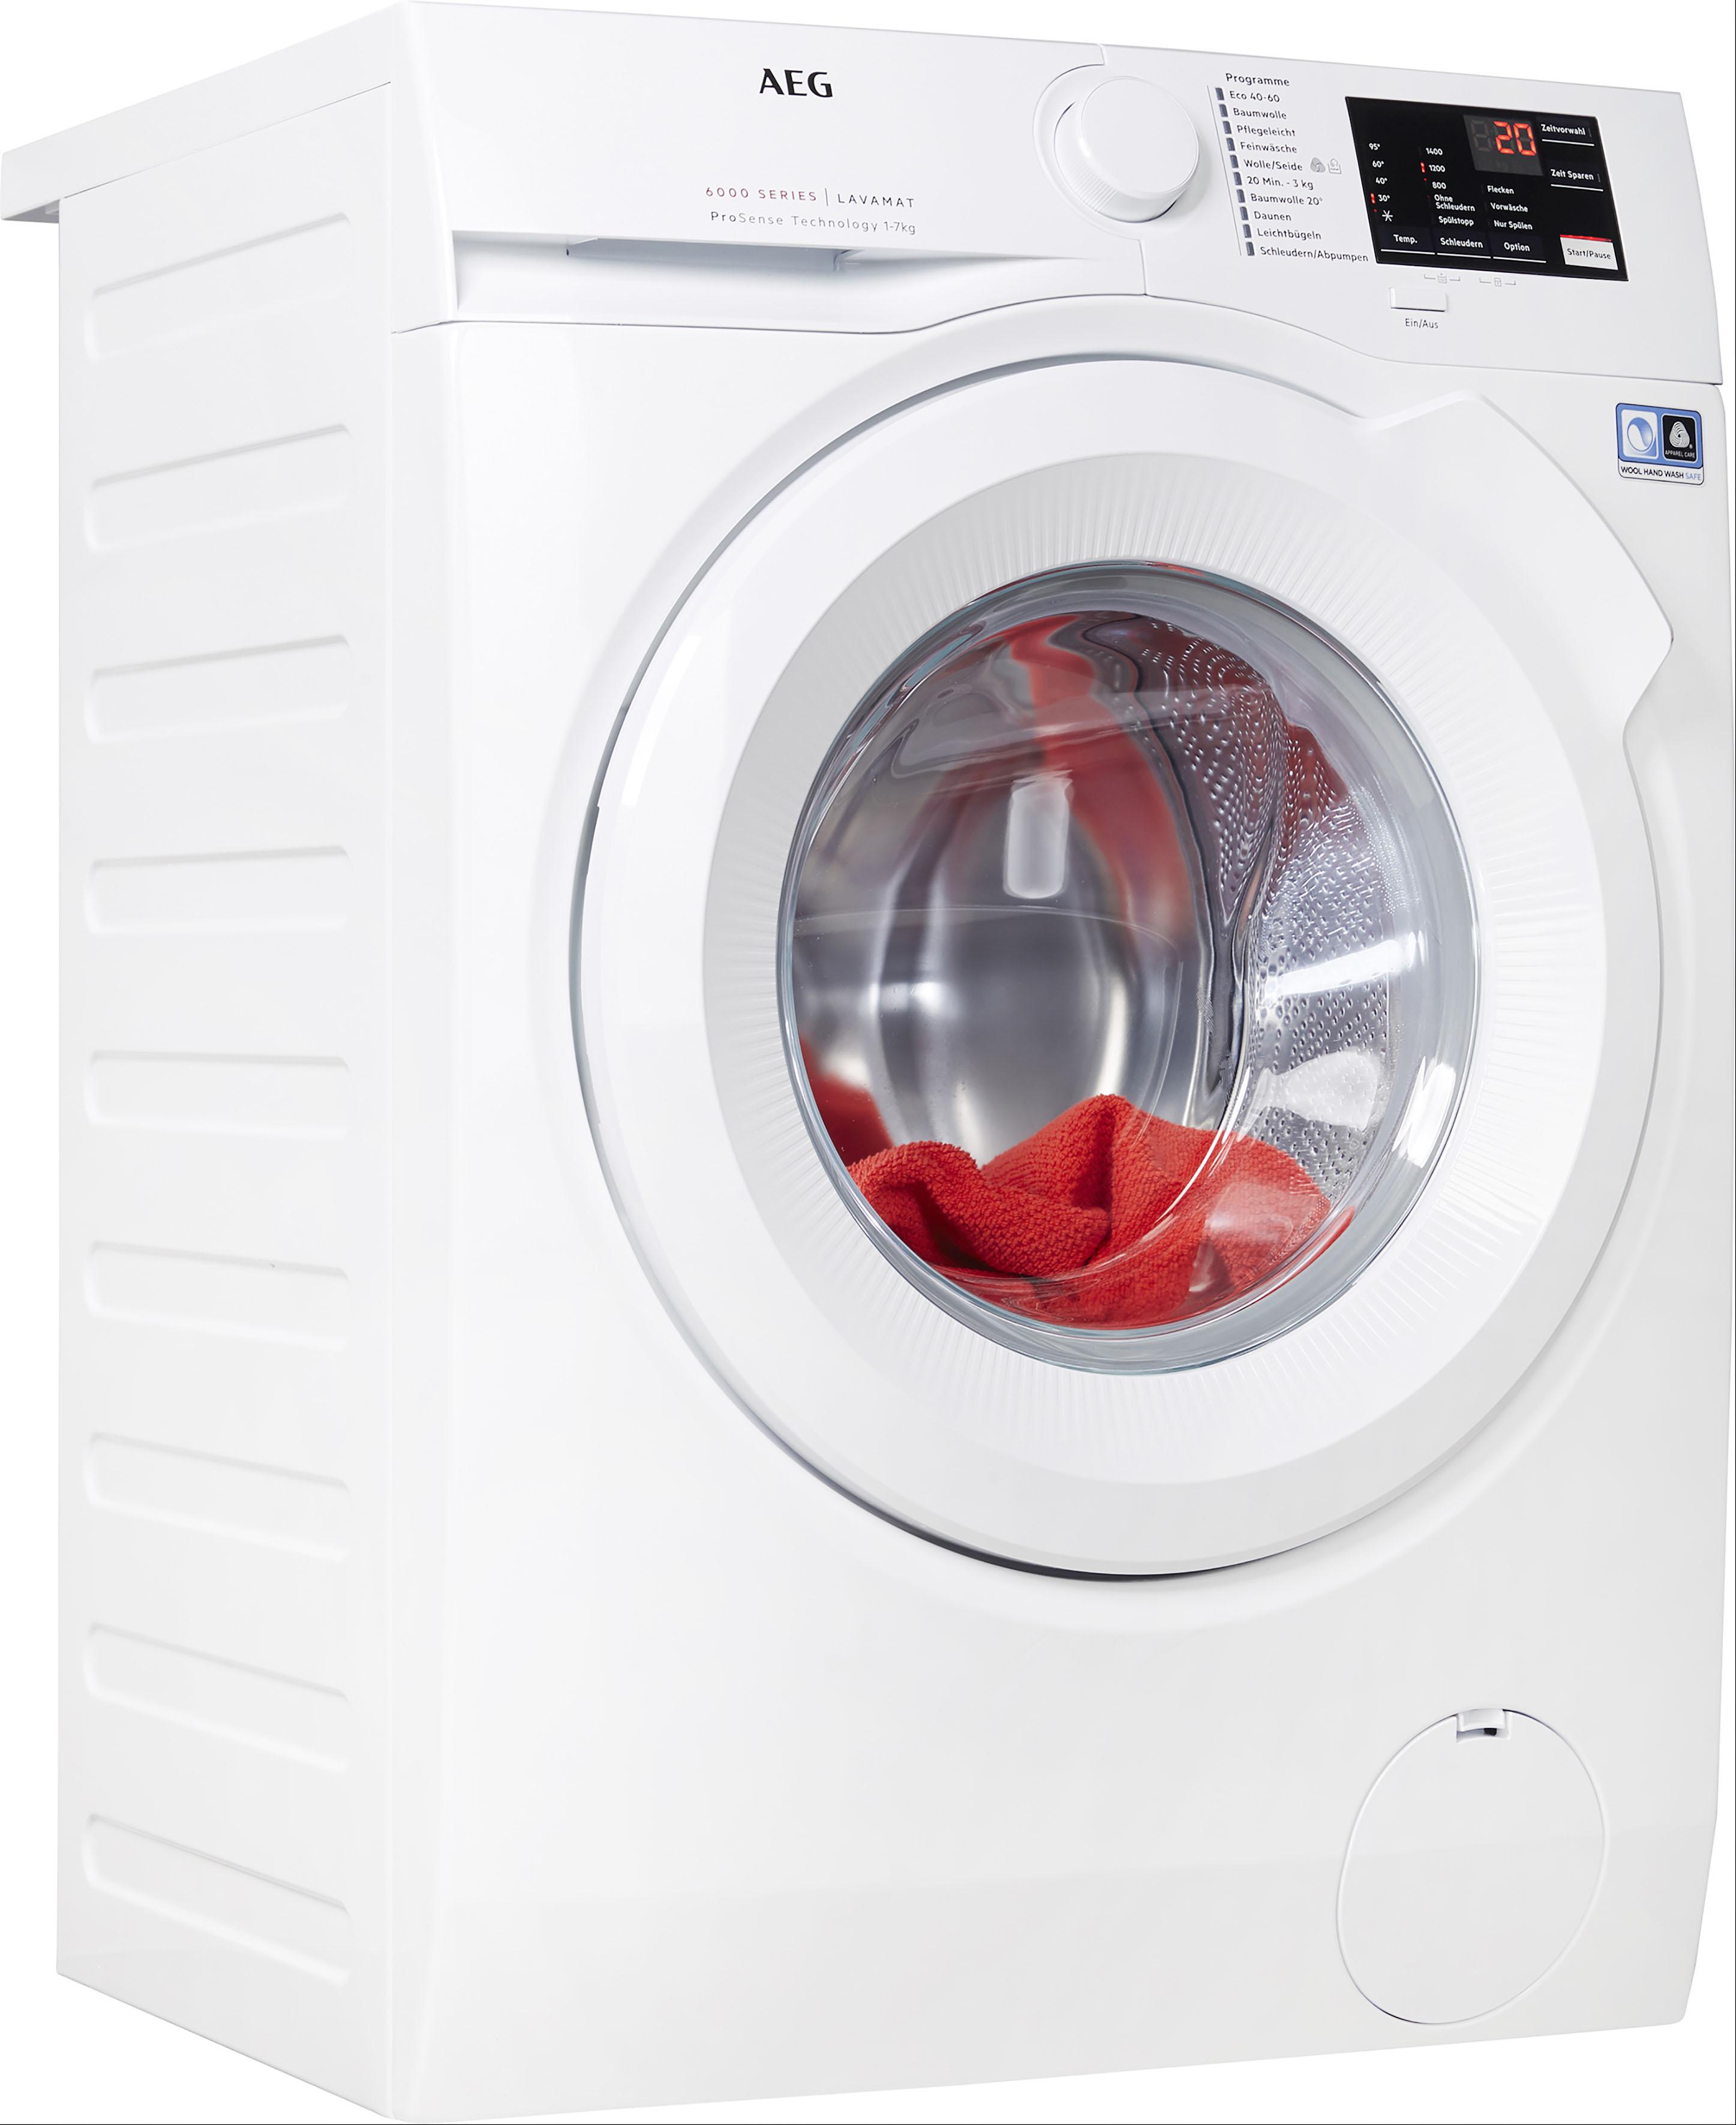 AEG Waschmaschine, L6FBA5470 EEK A+++ weiß Waschmaschinen Haushaltsgeräte Waschmaschine